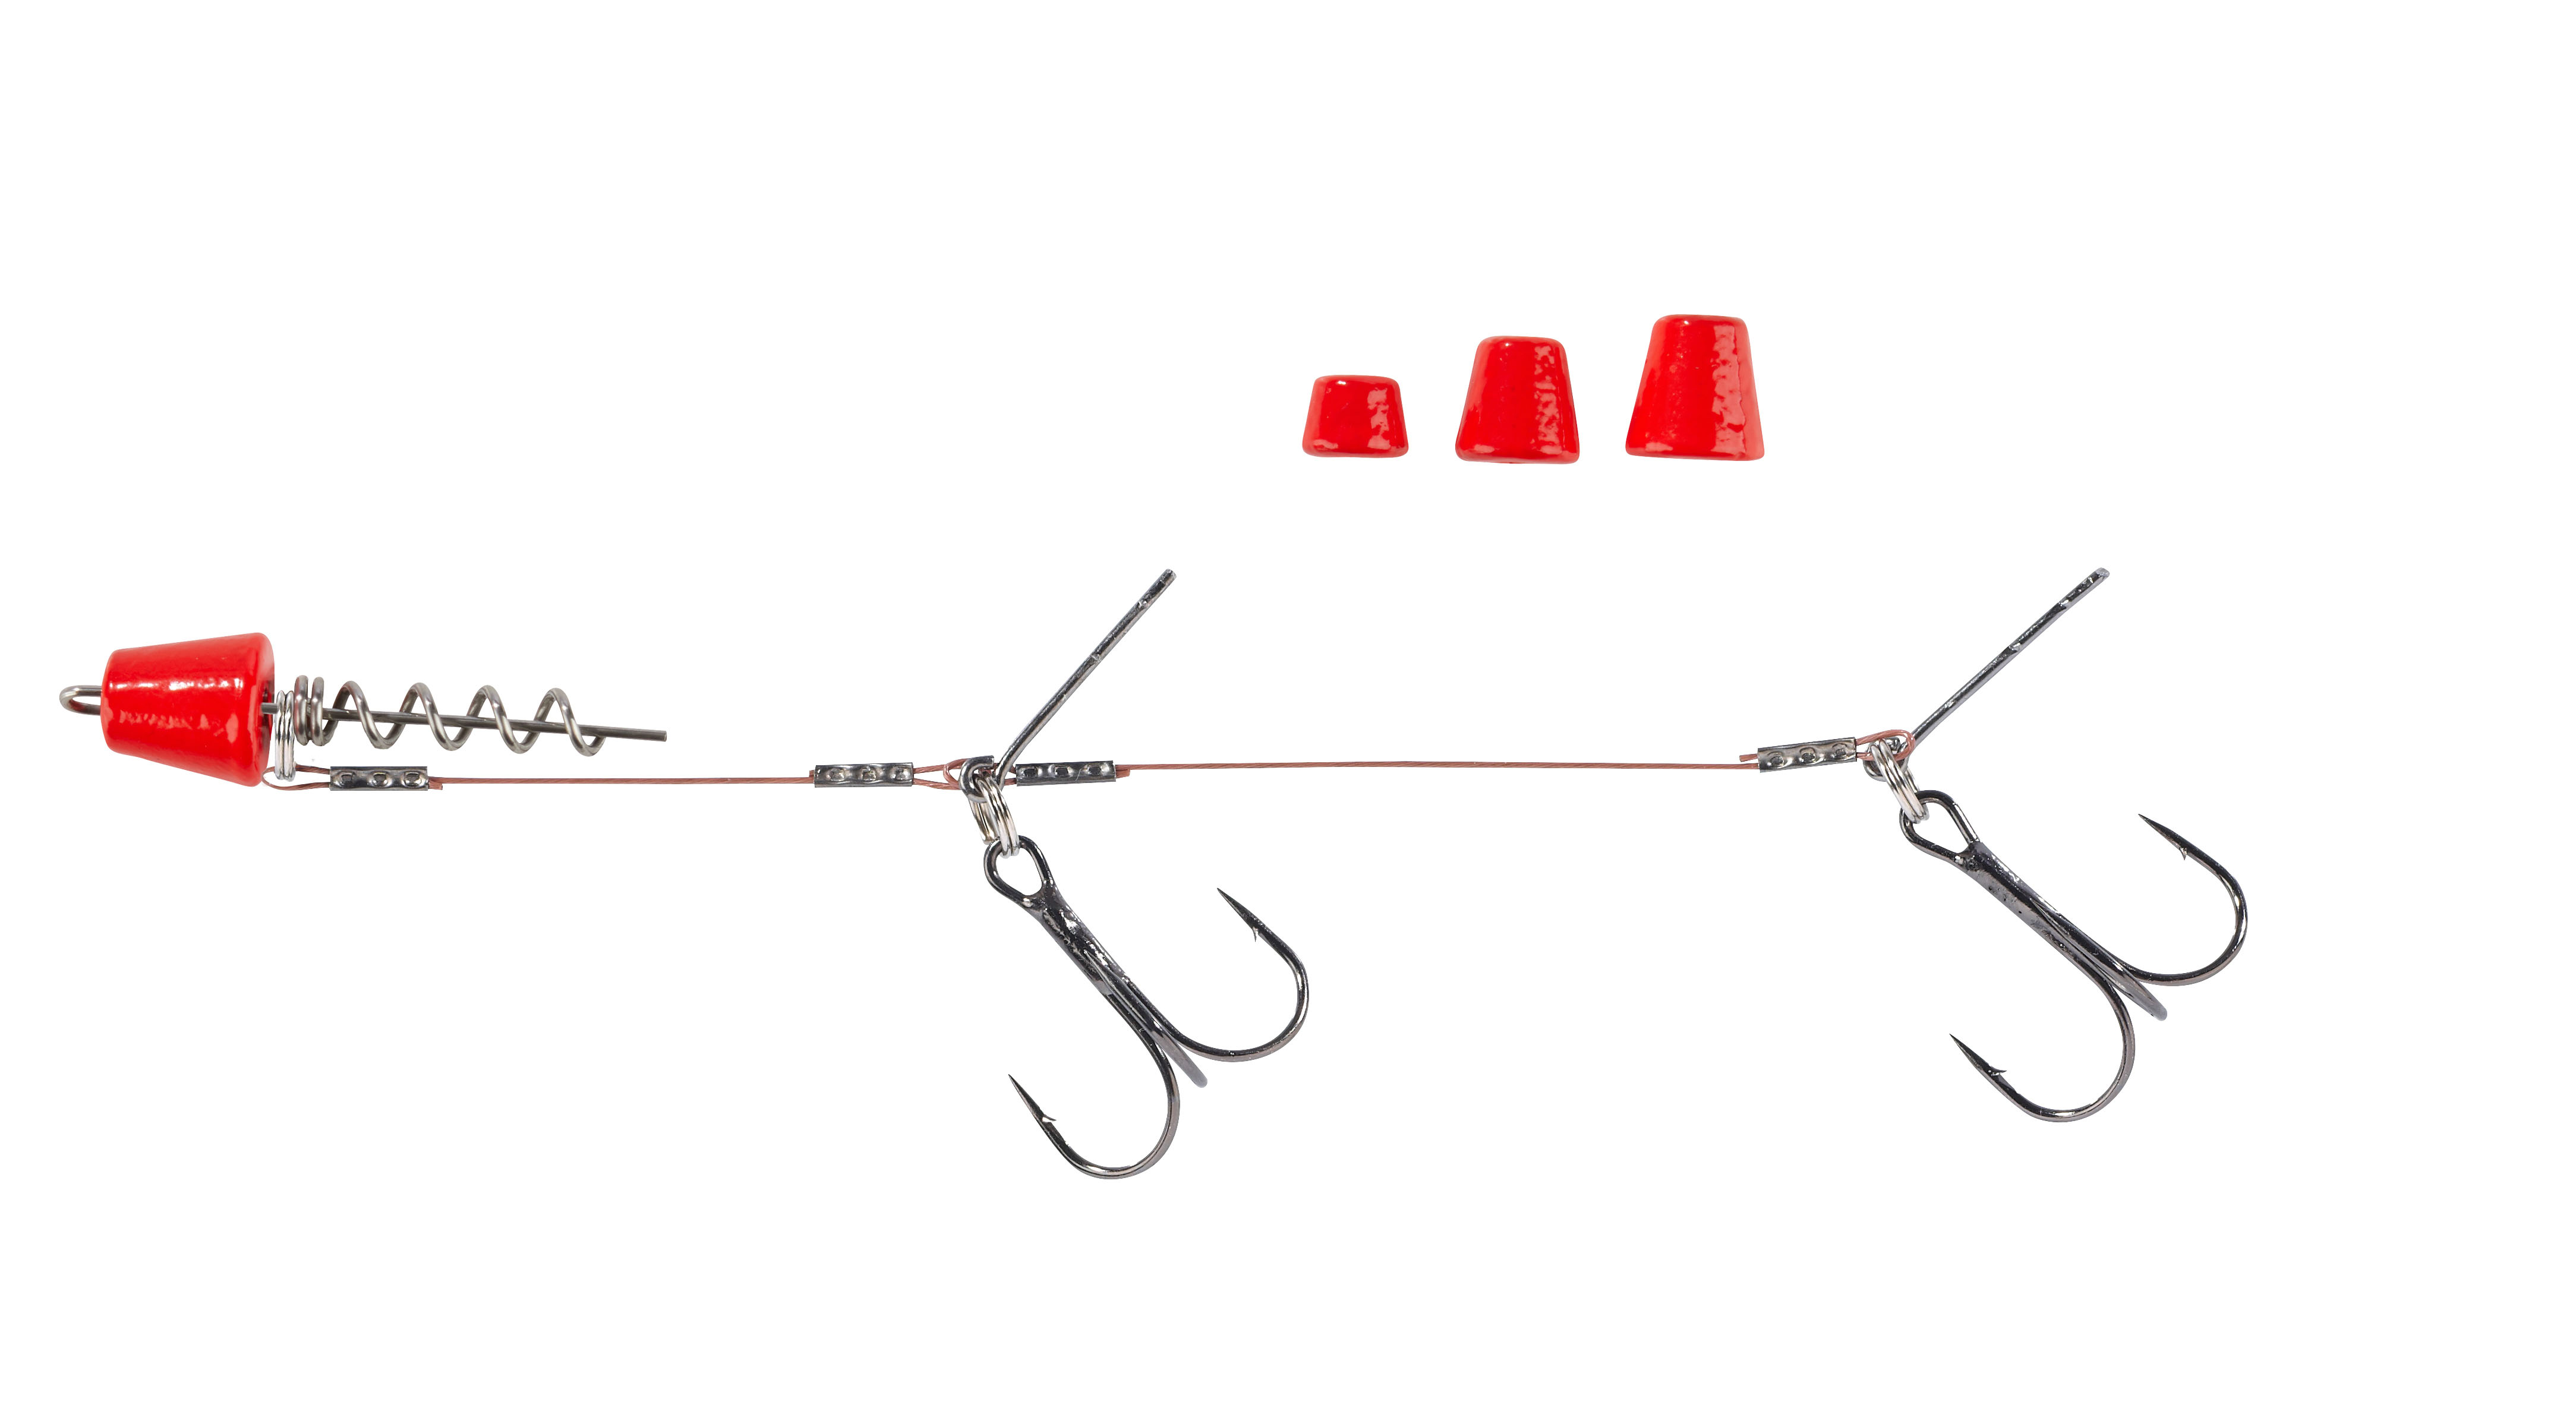 Balzer Shirasu Screw in Hechtsystem Wechselgewichten Fluo-Rot 9cm 14cm UV Activ